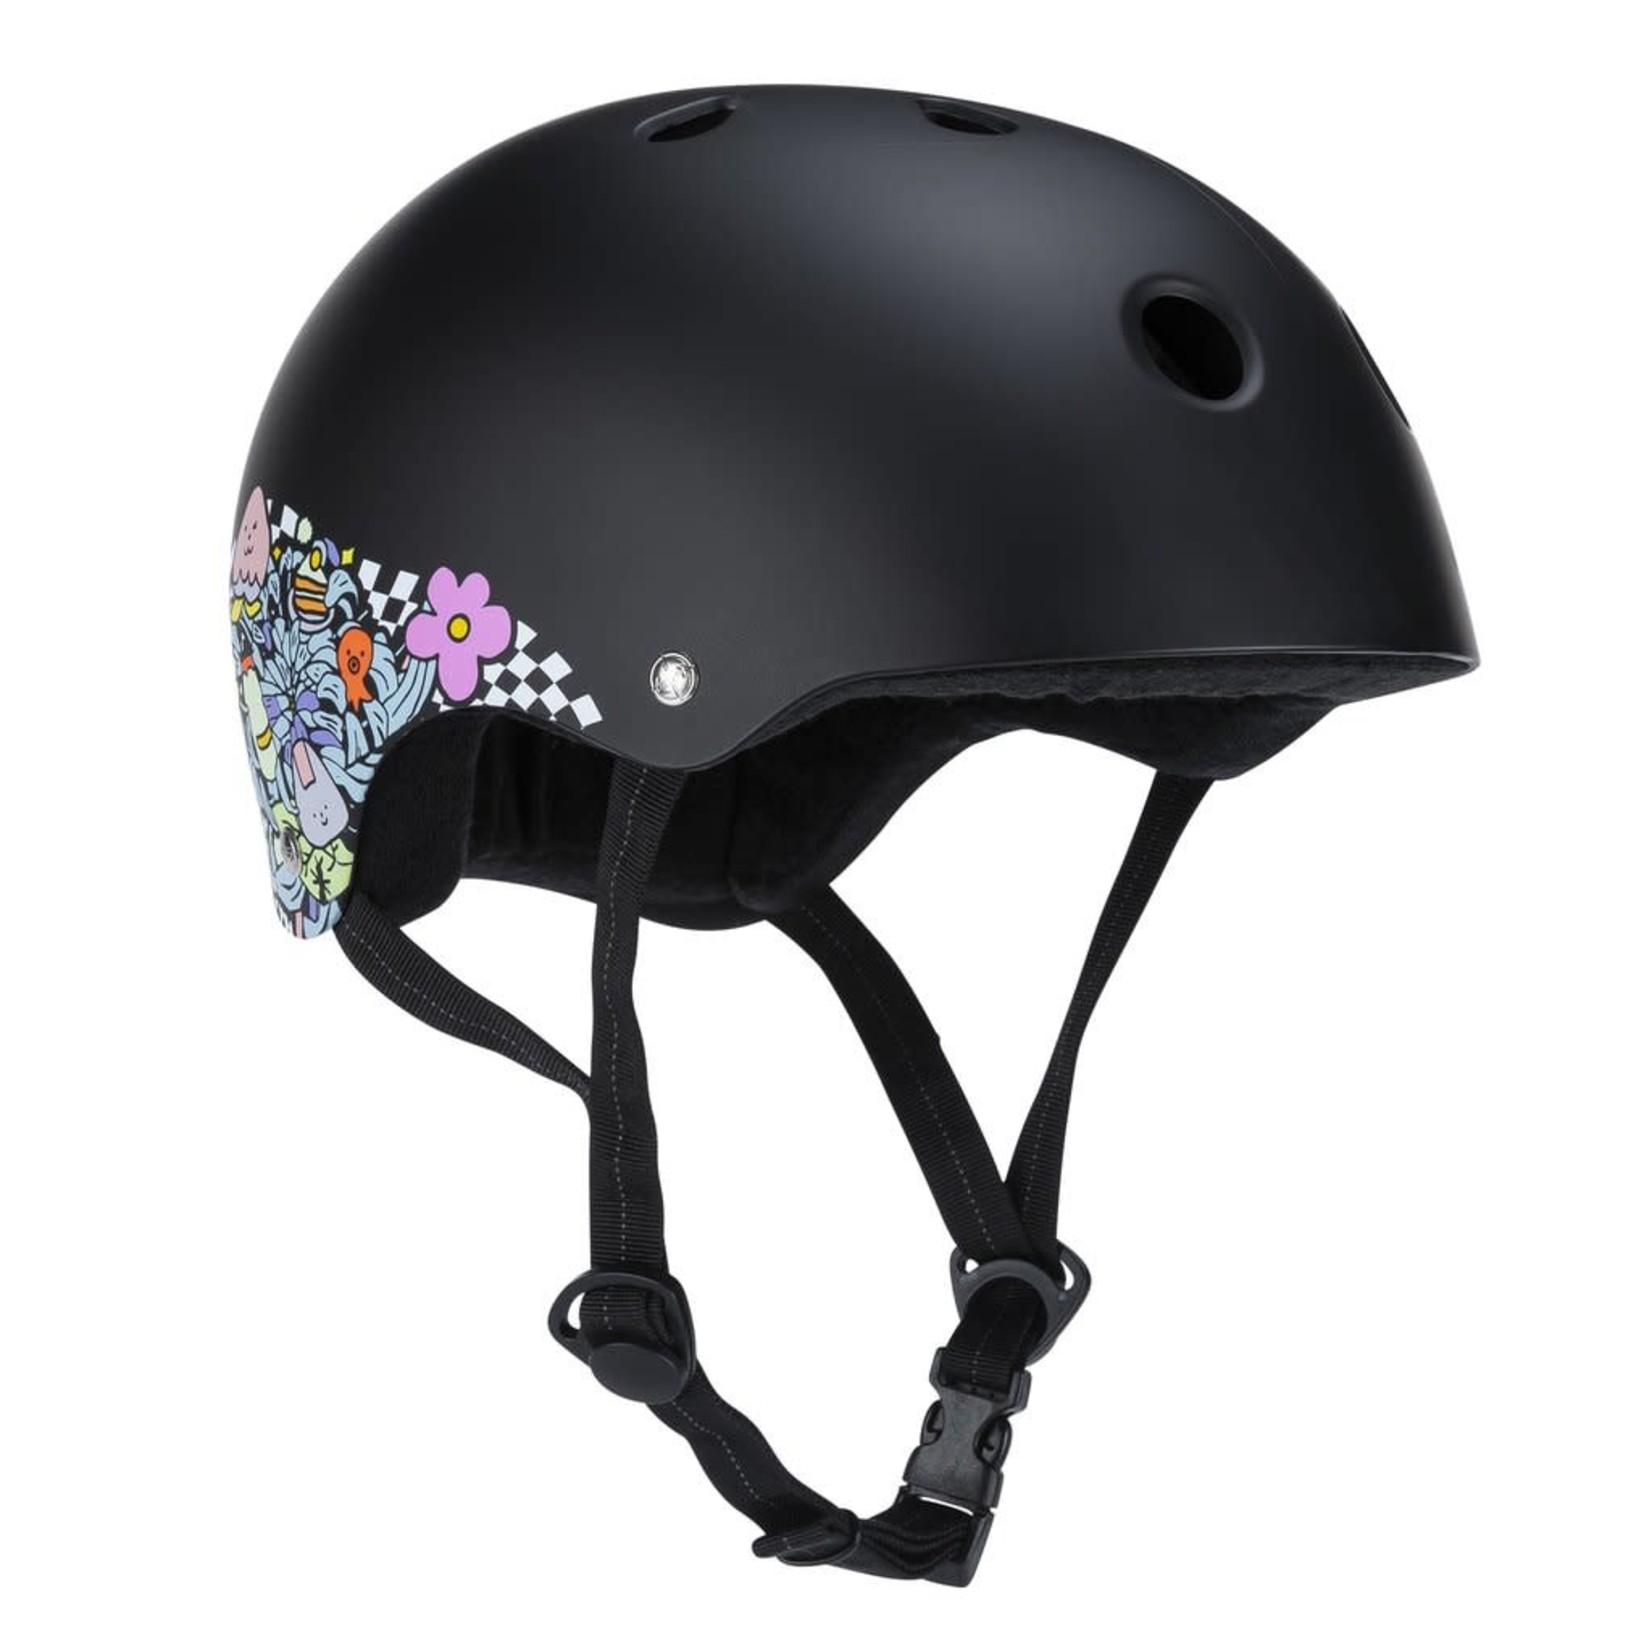 187 187 - Lizzie Armanto Helmet with Sweat Saver - Black